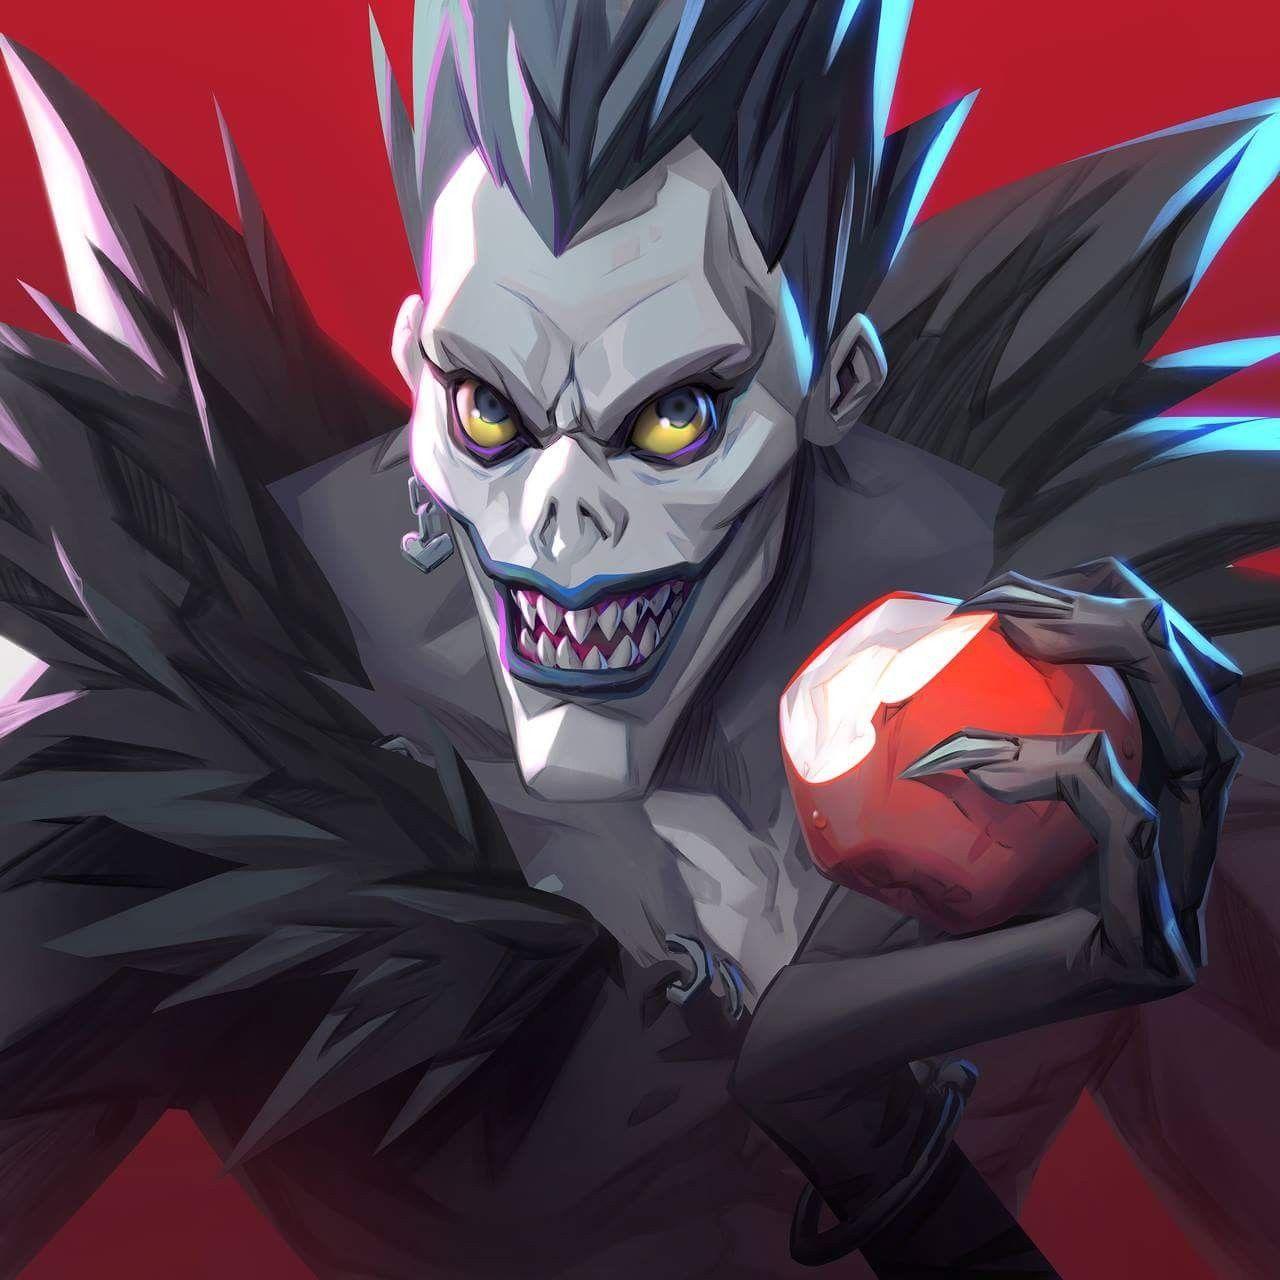 Pin de Bűbbles Åłï em Death Note Anime, Casal anime